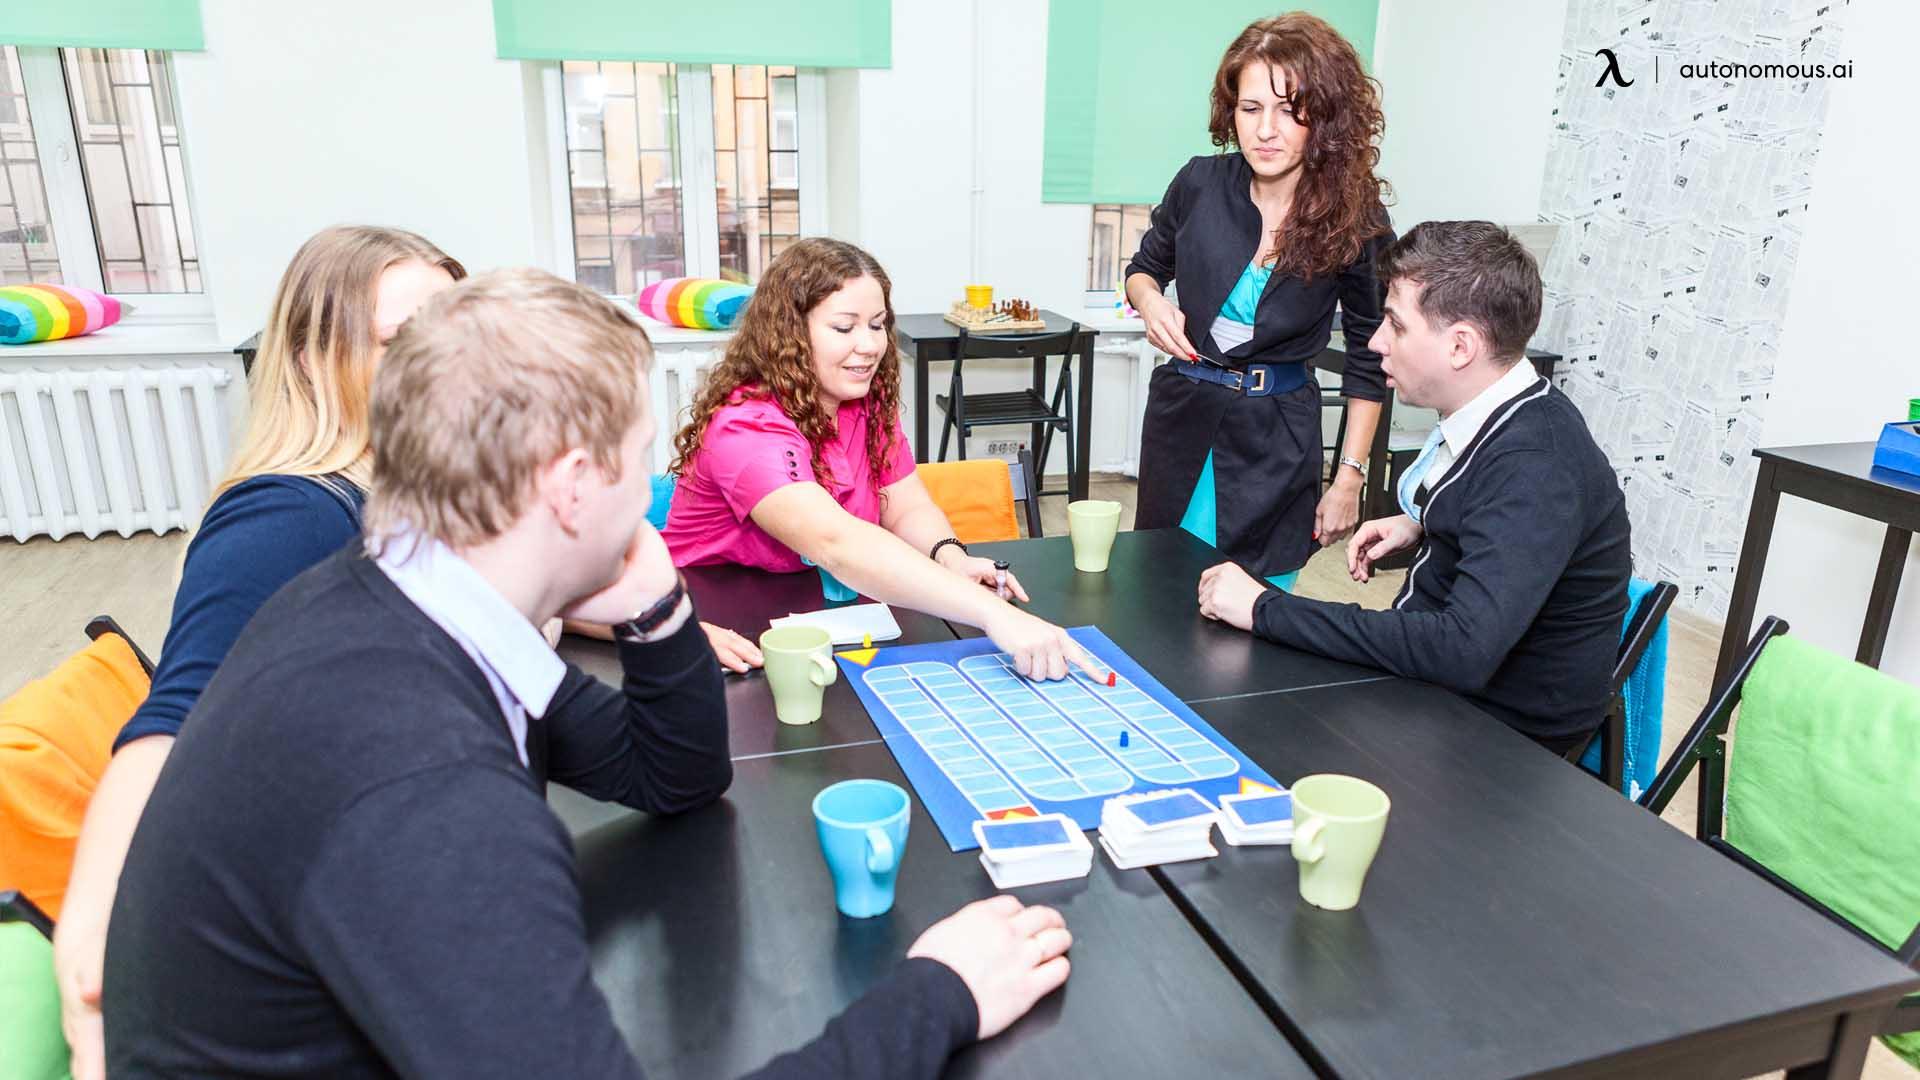 Break Out A Board Game